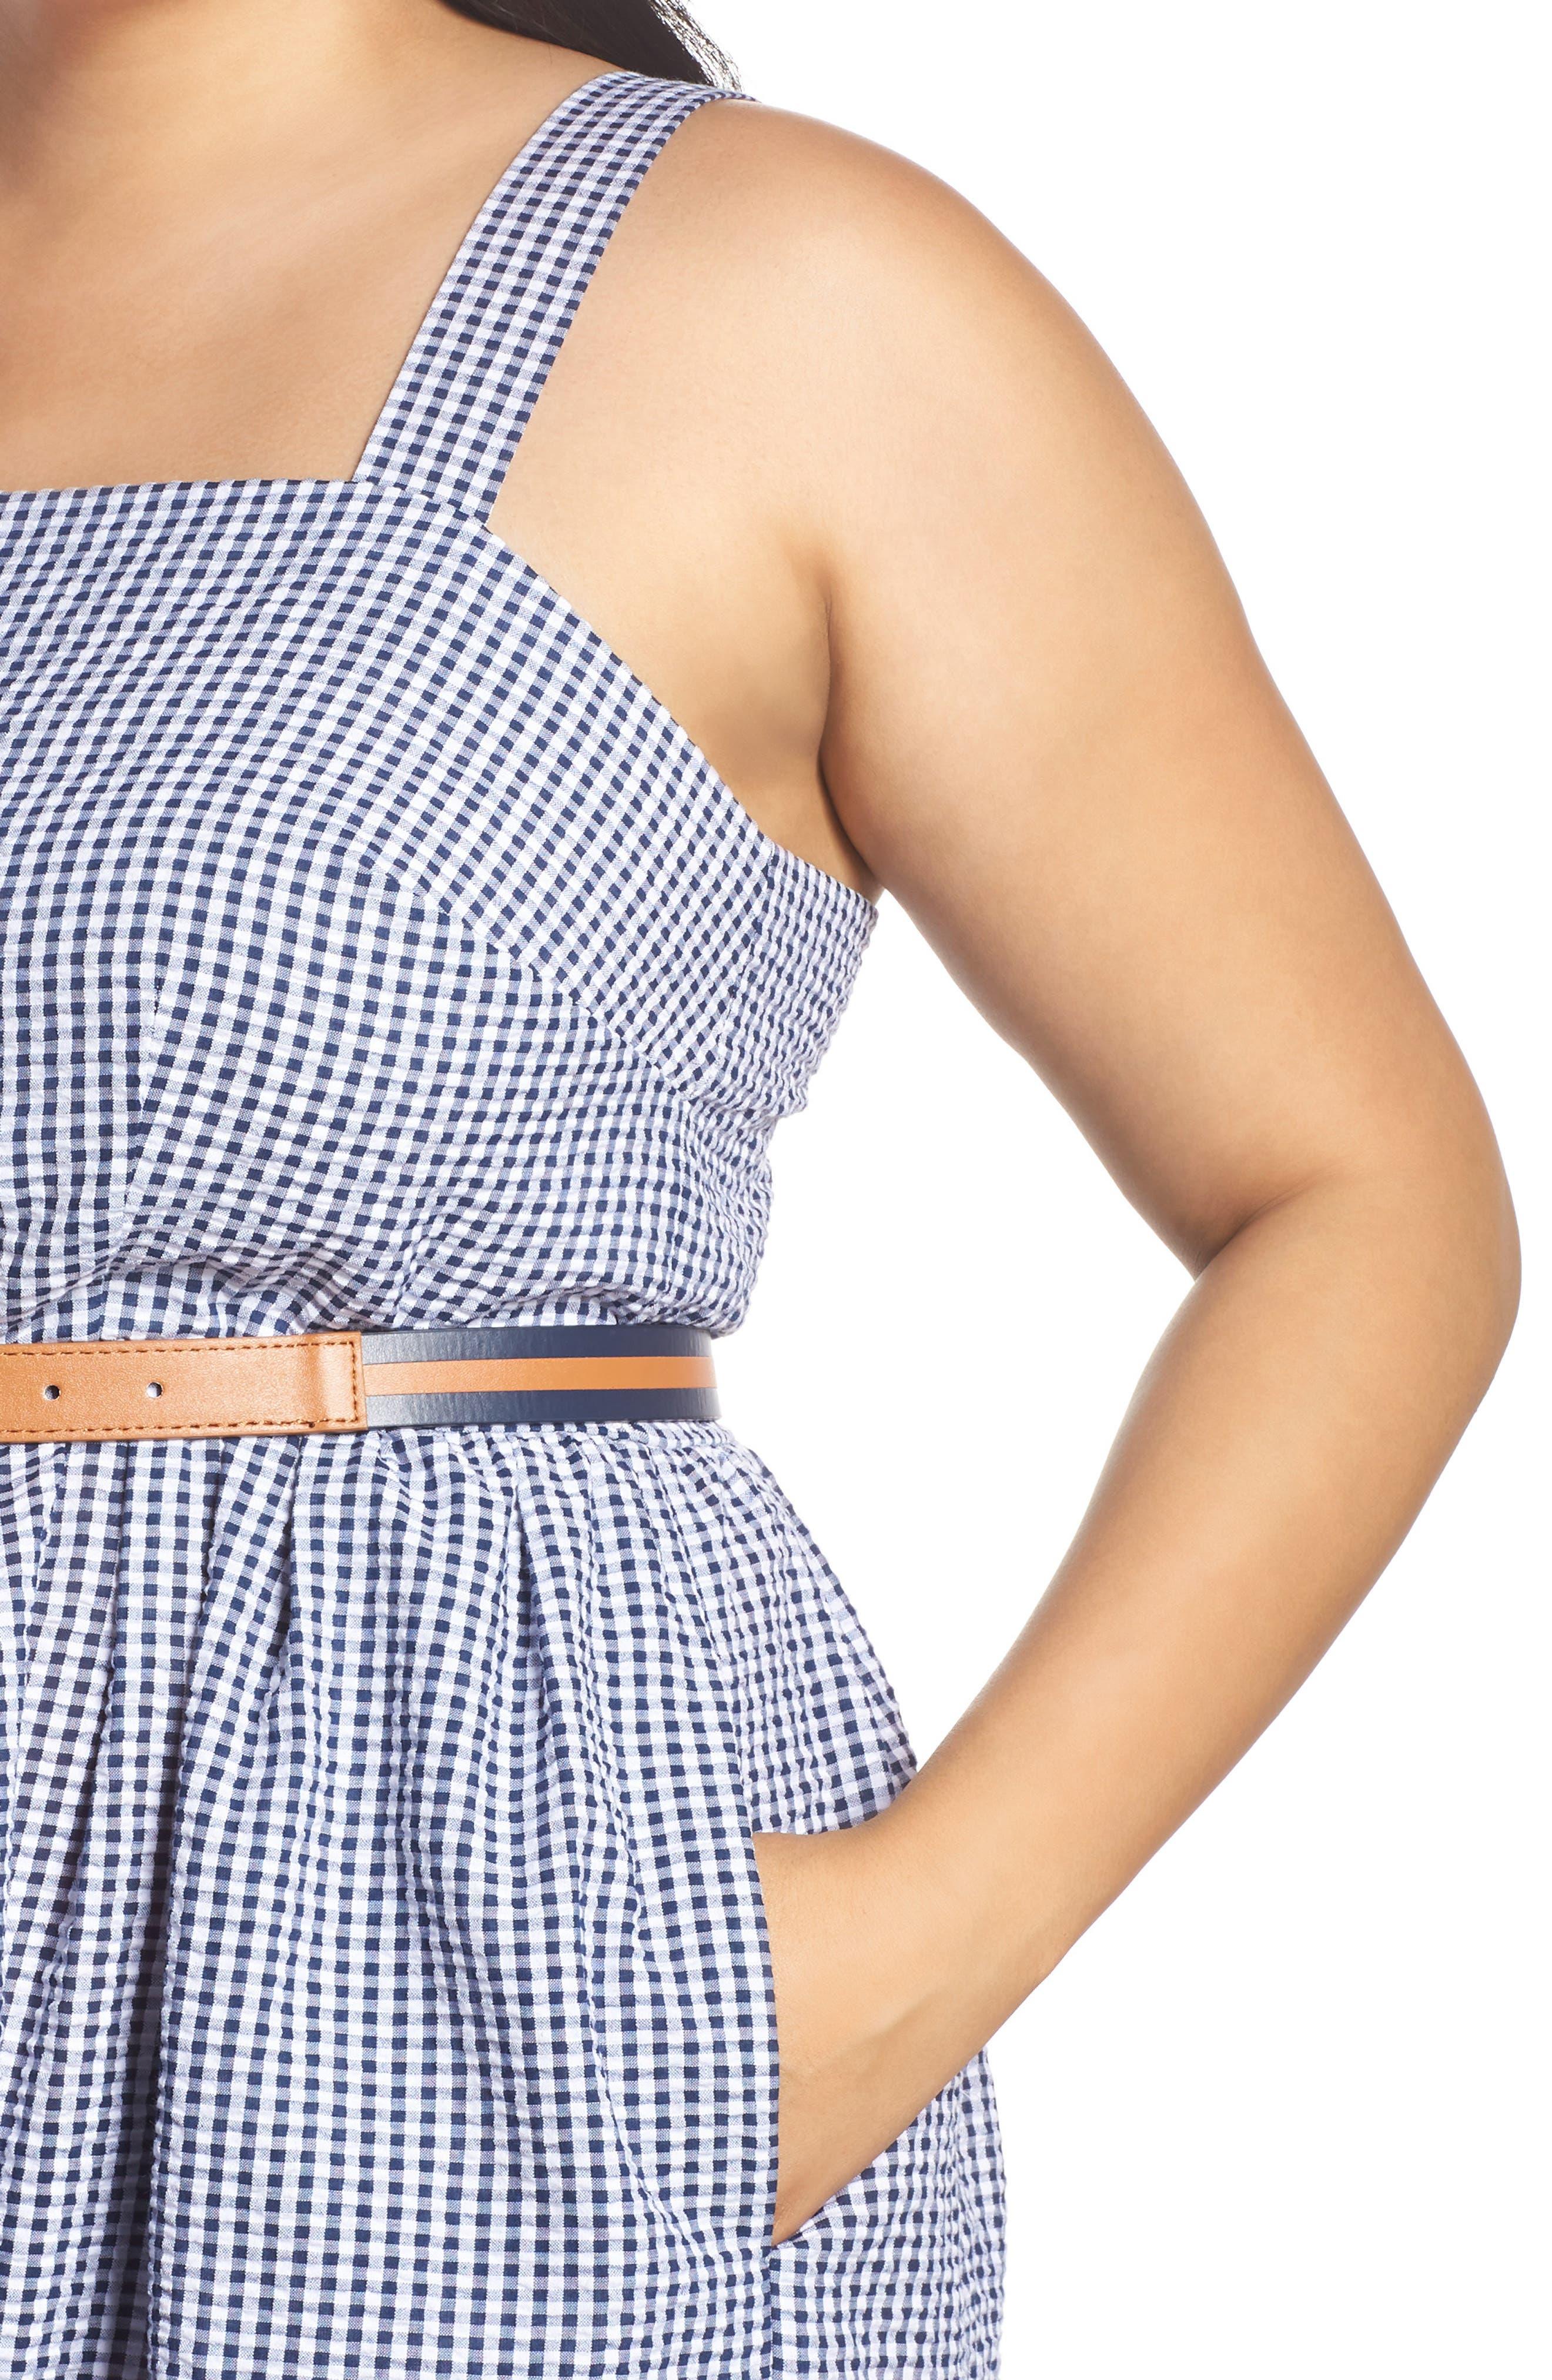 Belted Gingham Seersucker Fit & Flare Dress,                             Alternate thumbnail 4, color,                             Navy/ Ivory